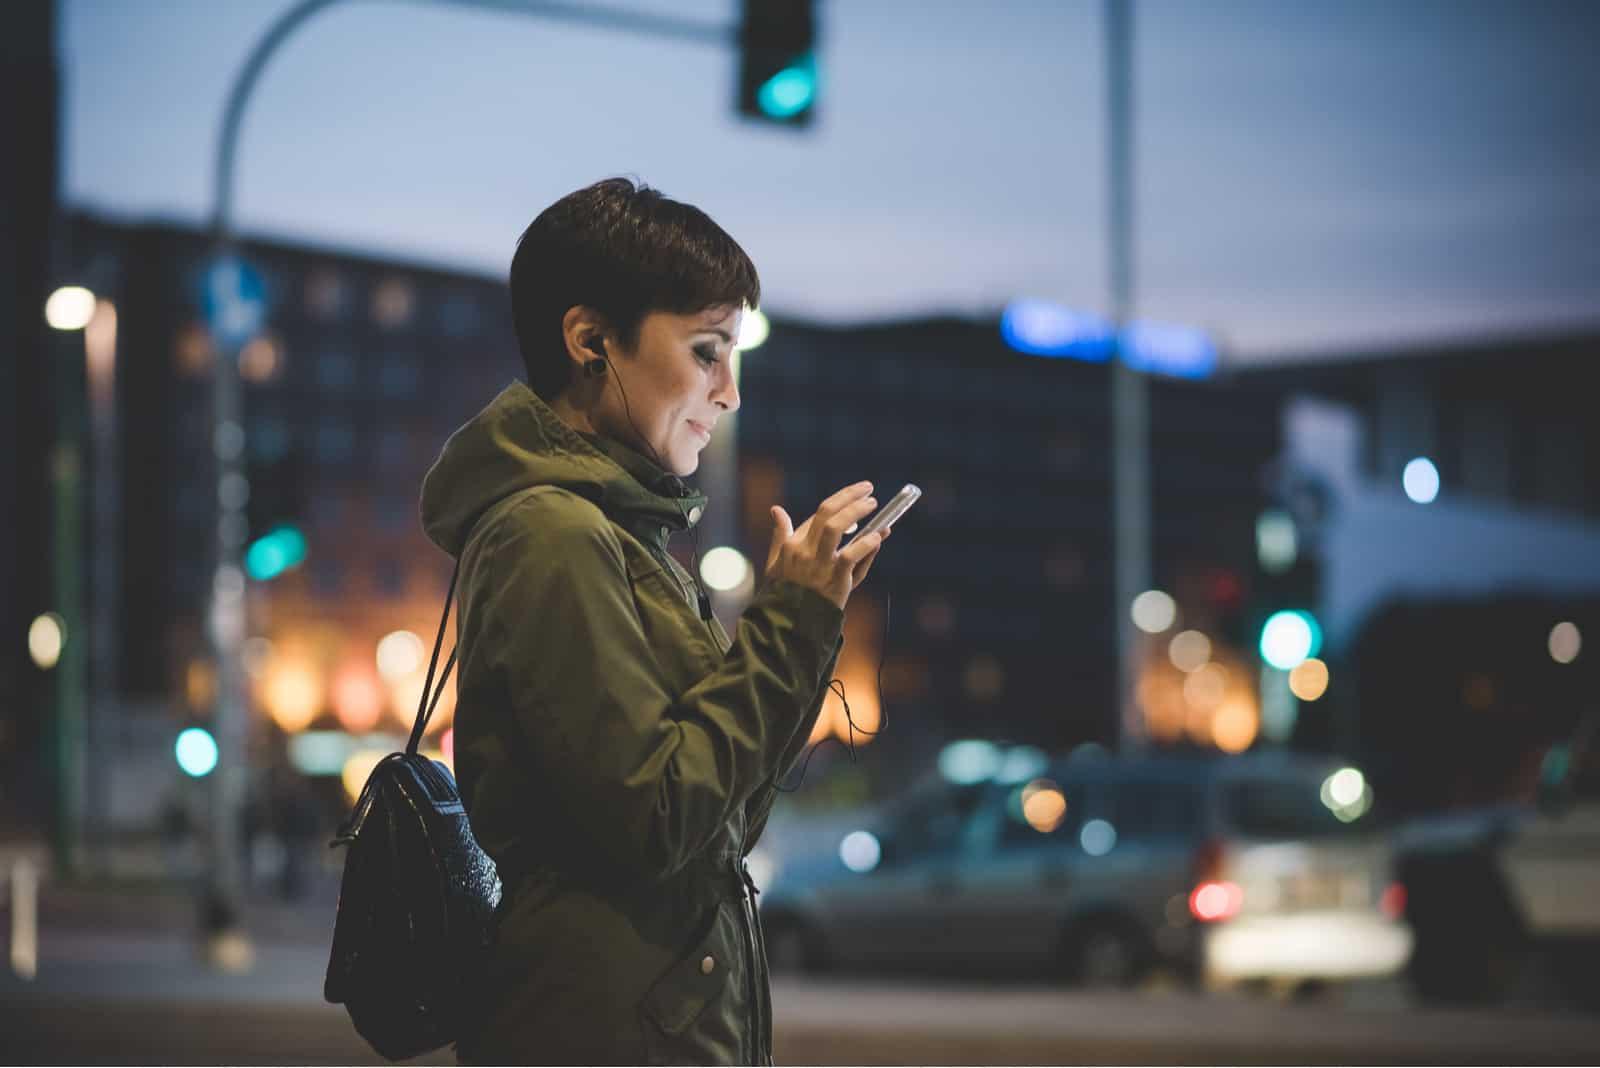 femme tenant un smartphone